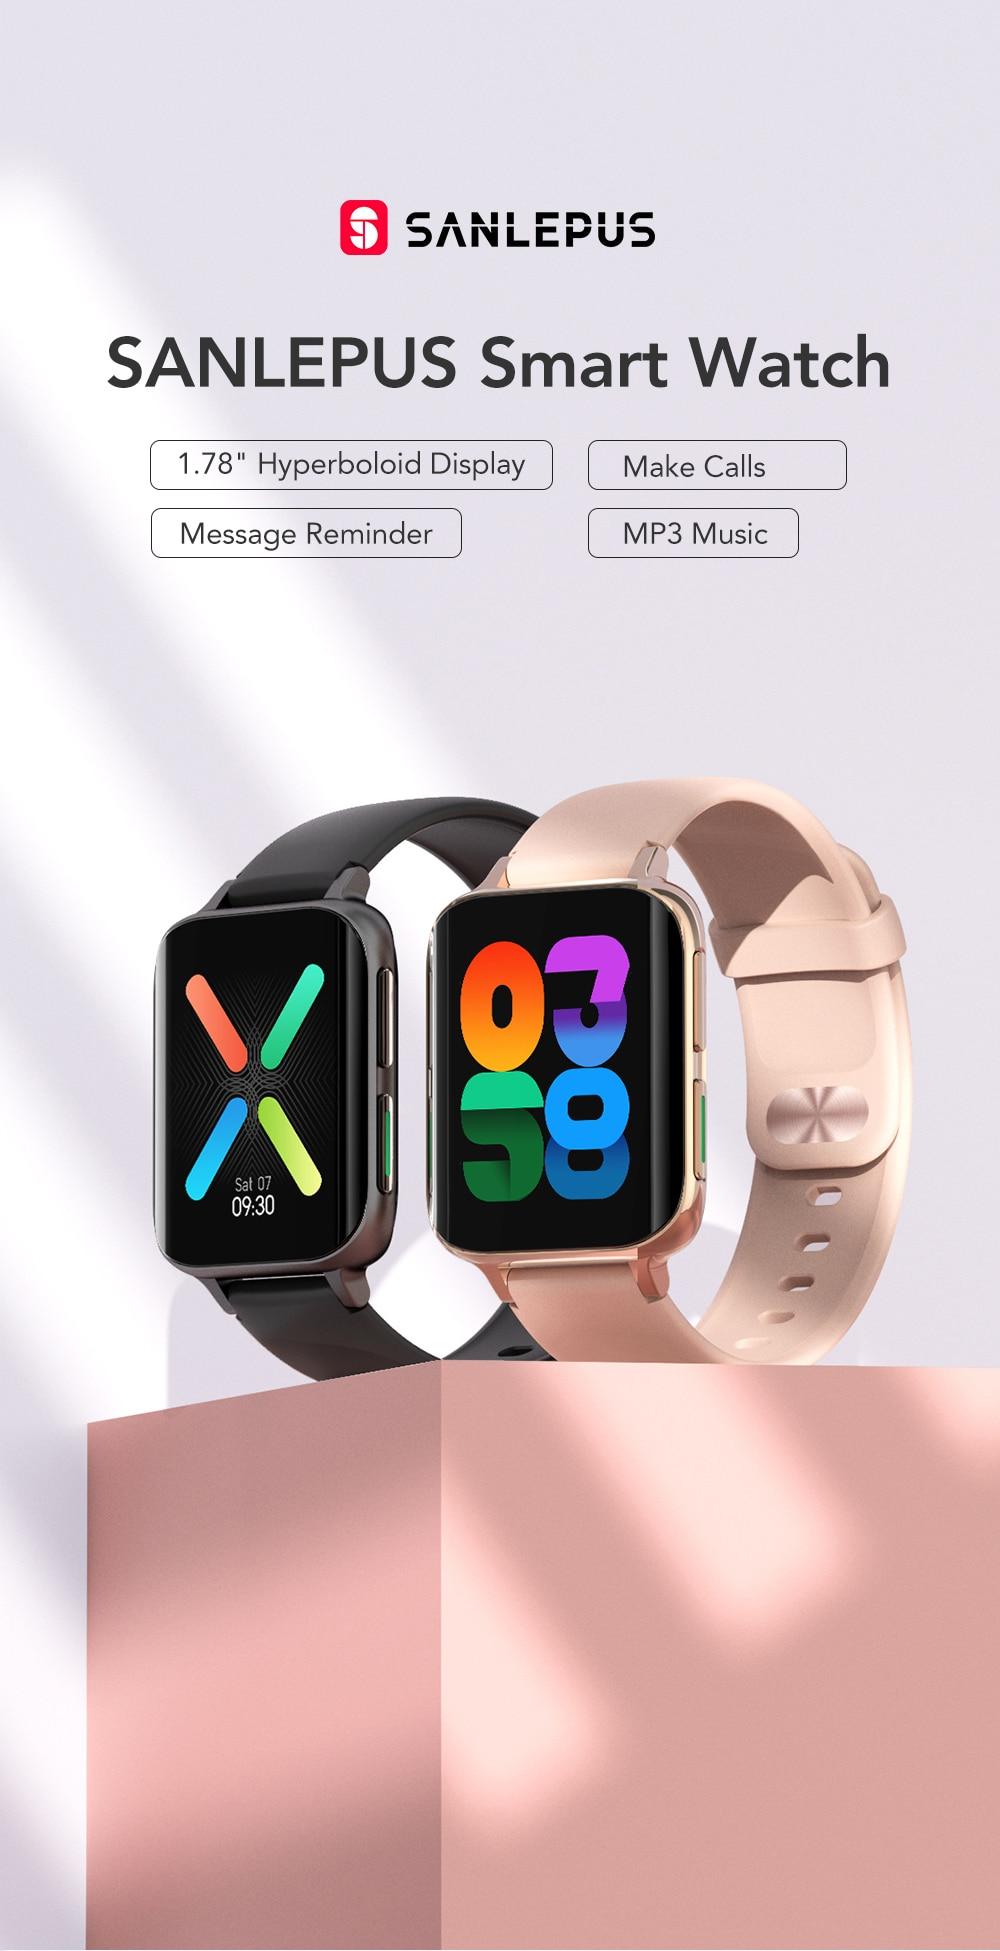 Hbc0bd323ca3146f0b22452e39ad4fd0eI SANLEPUS 2021 NEW Dial Calls Smart Watch Men Women Waterproof Smartwatch MP3 Player For OPPO Android Apple Xiaomi Huawei